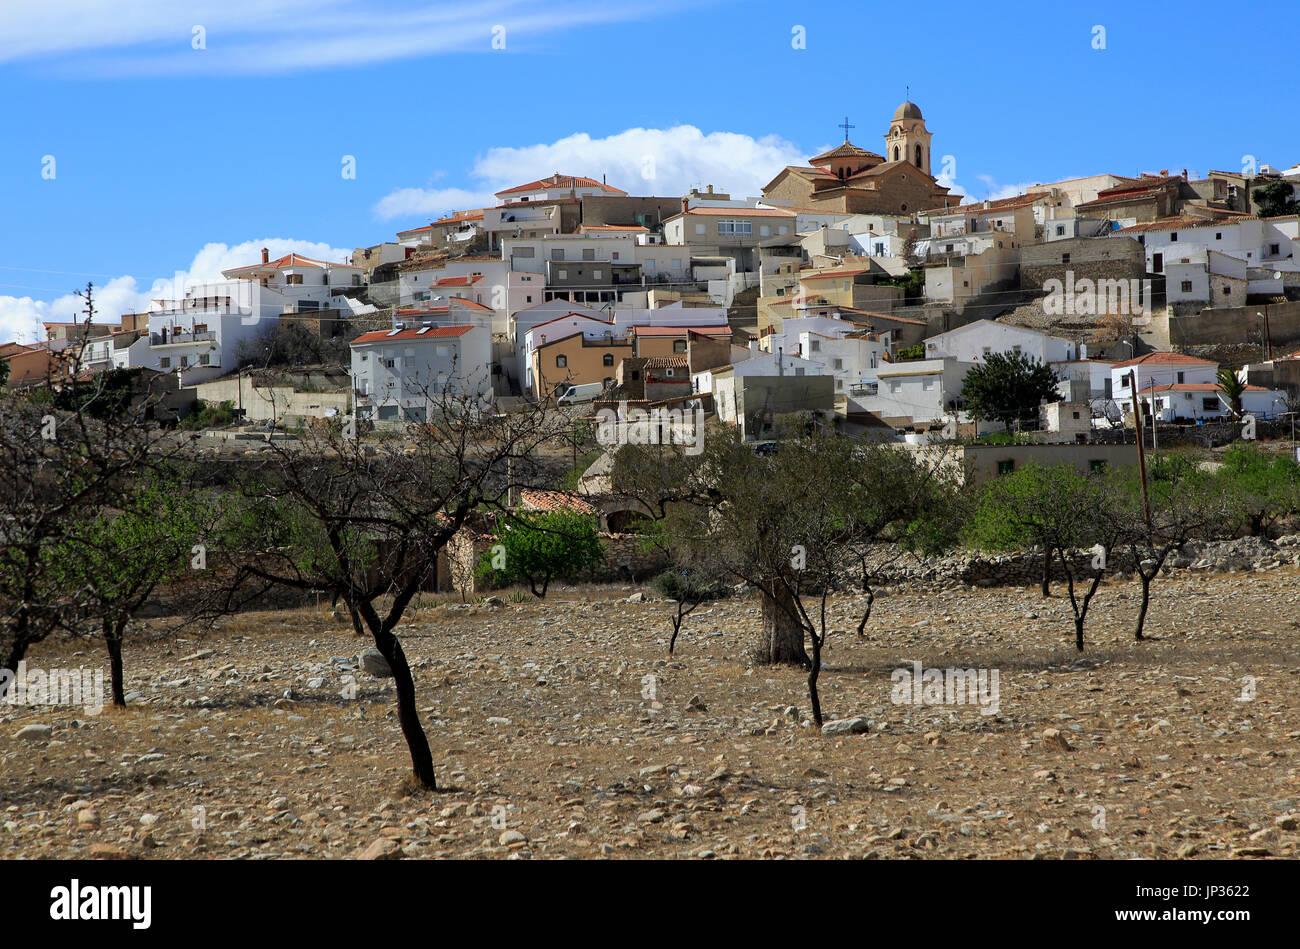 Fruit trees growing in farmland, village of Uleila del Campo, Almeria, Spain - Stock Image